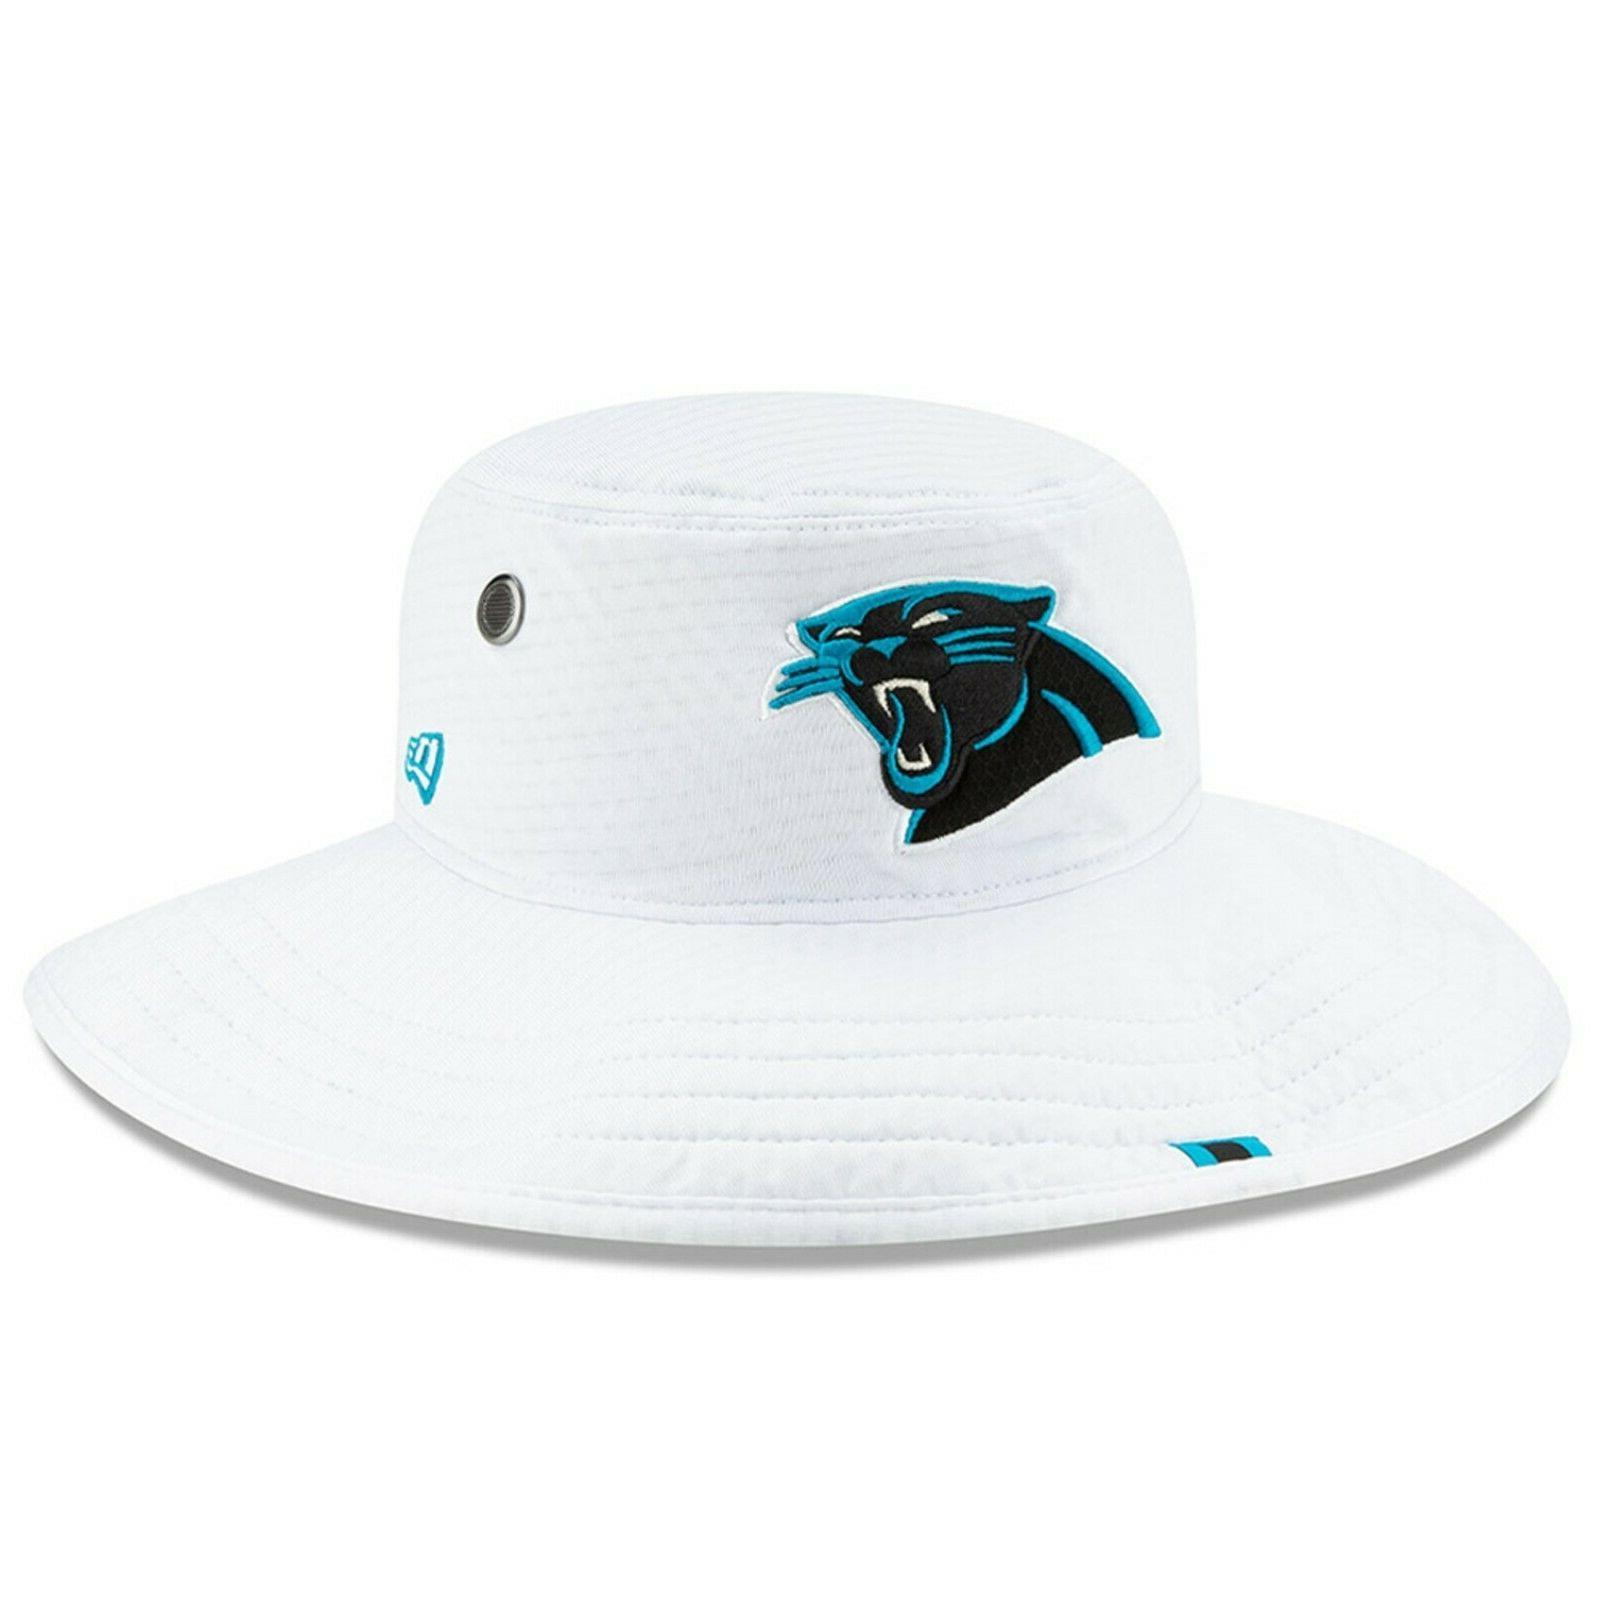 Carolina Panthers White Bucket Hat 2019 -